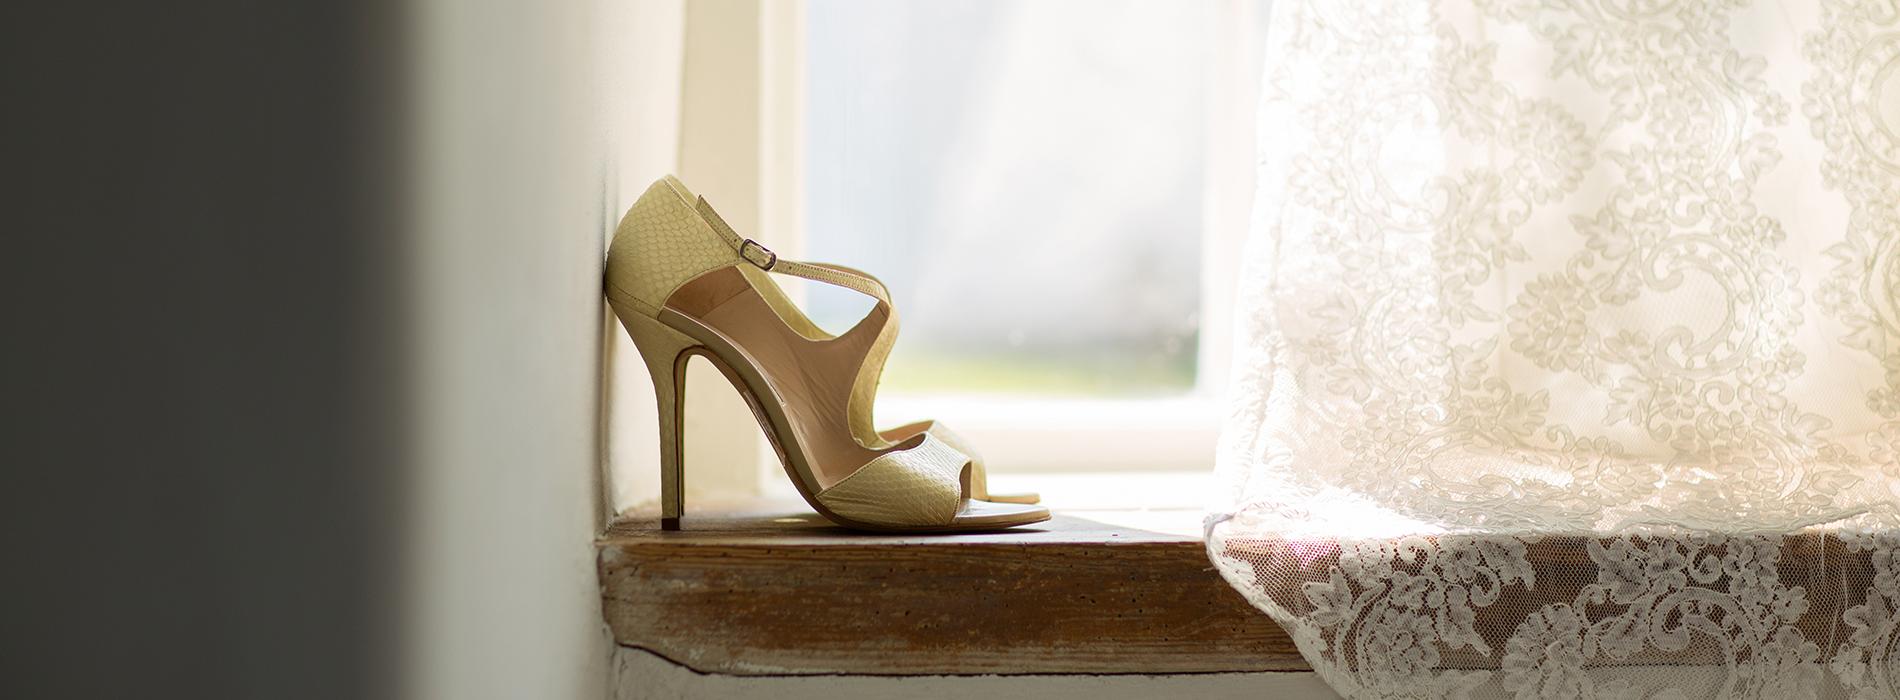 Bröllopspriser